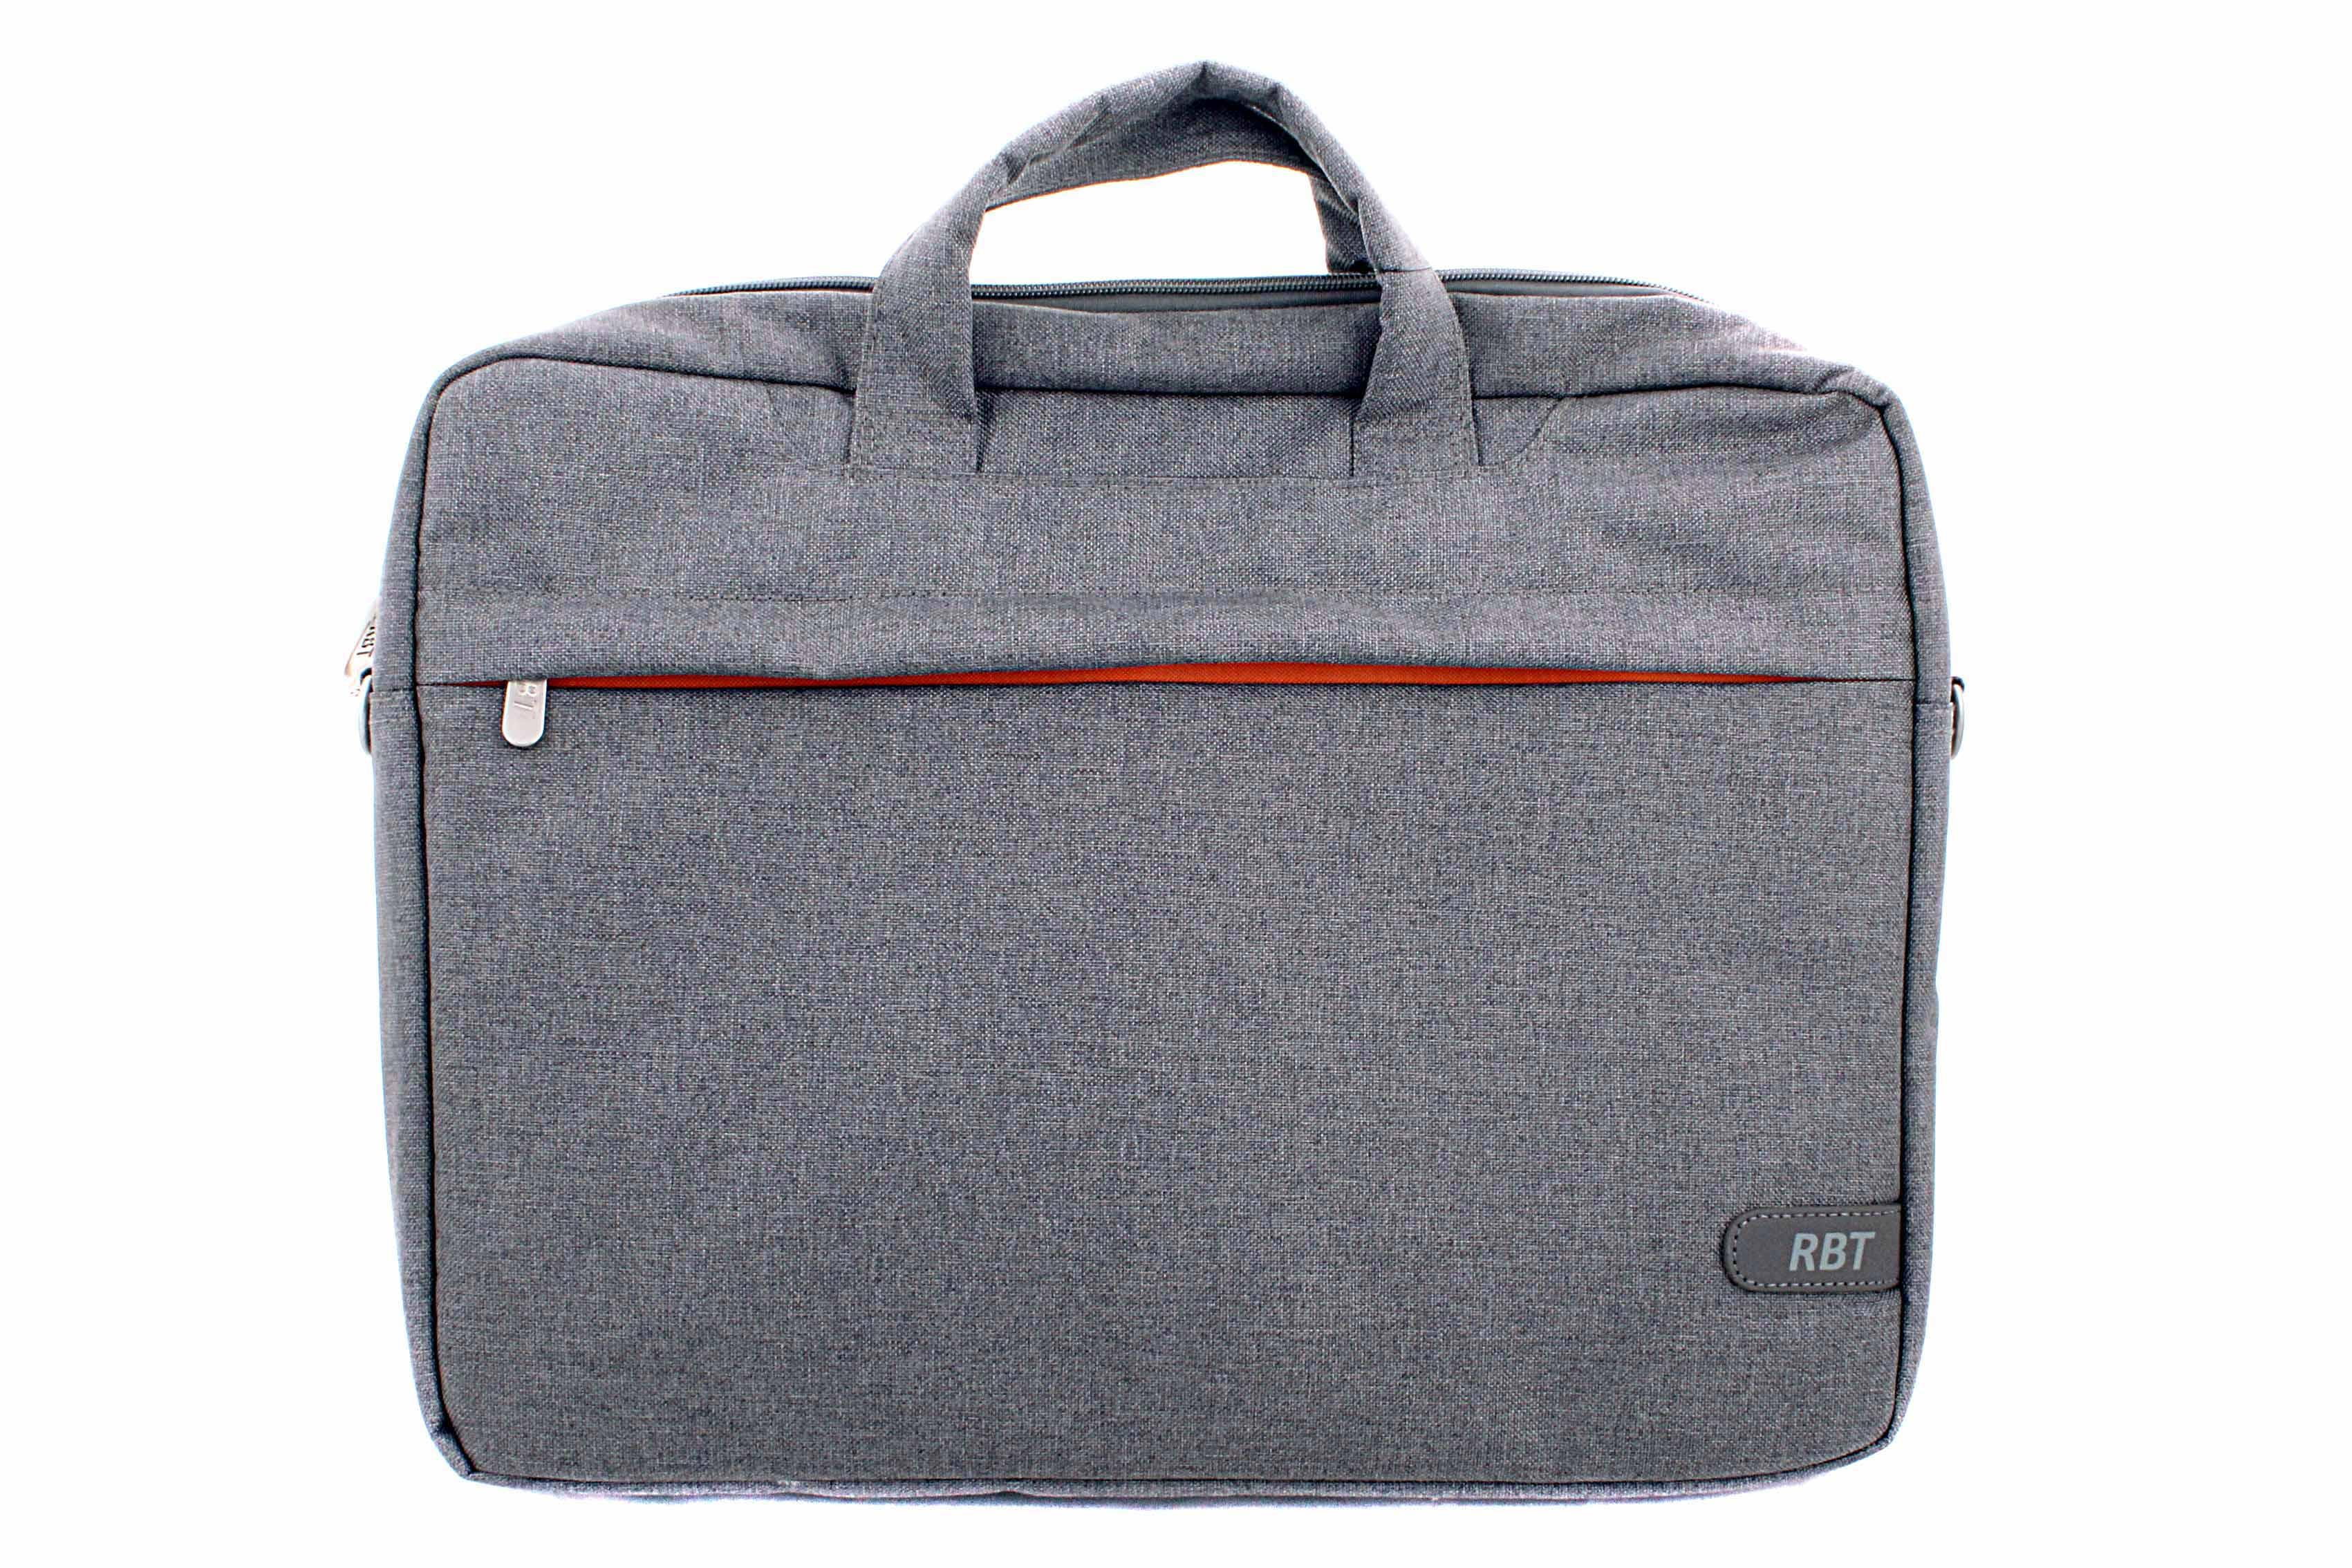 Кейс для ноутбука Рбт Real Brand Technics 999.000